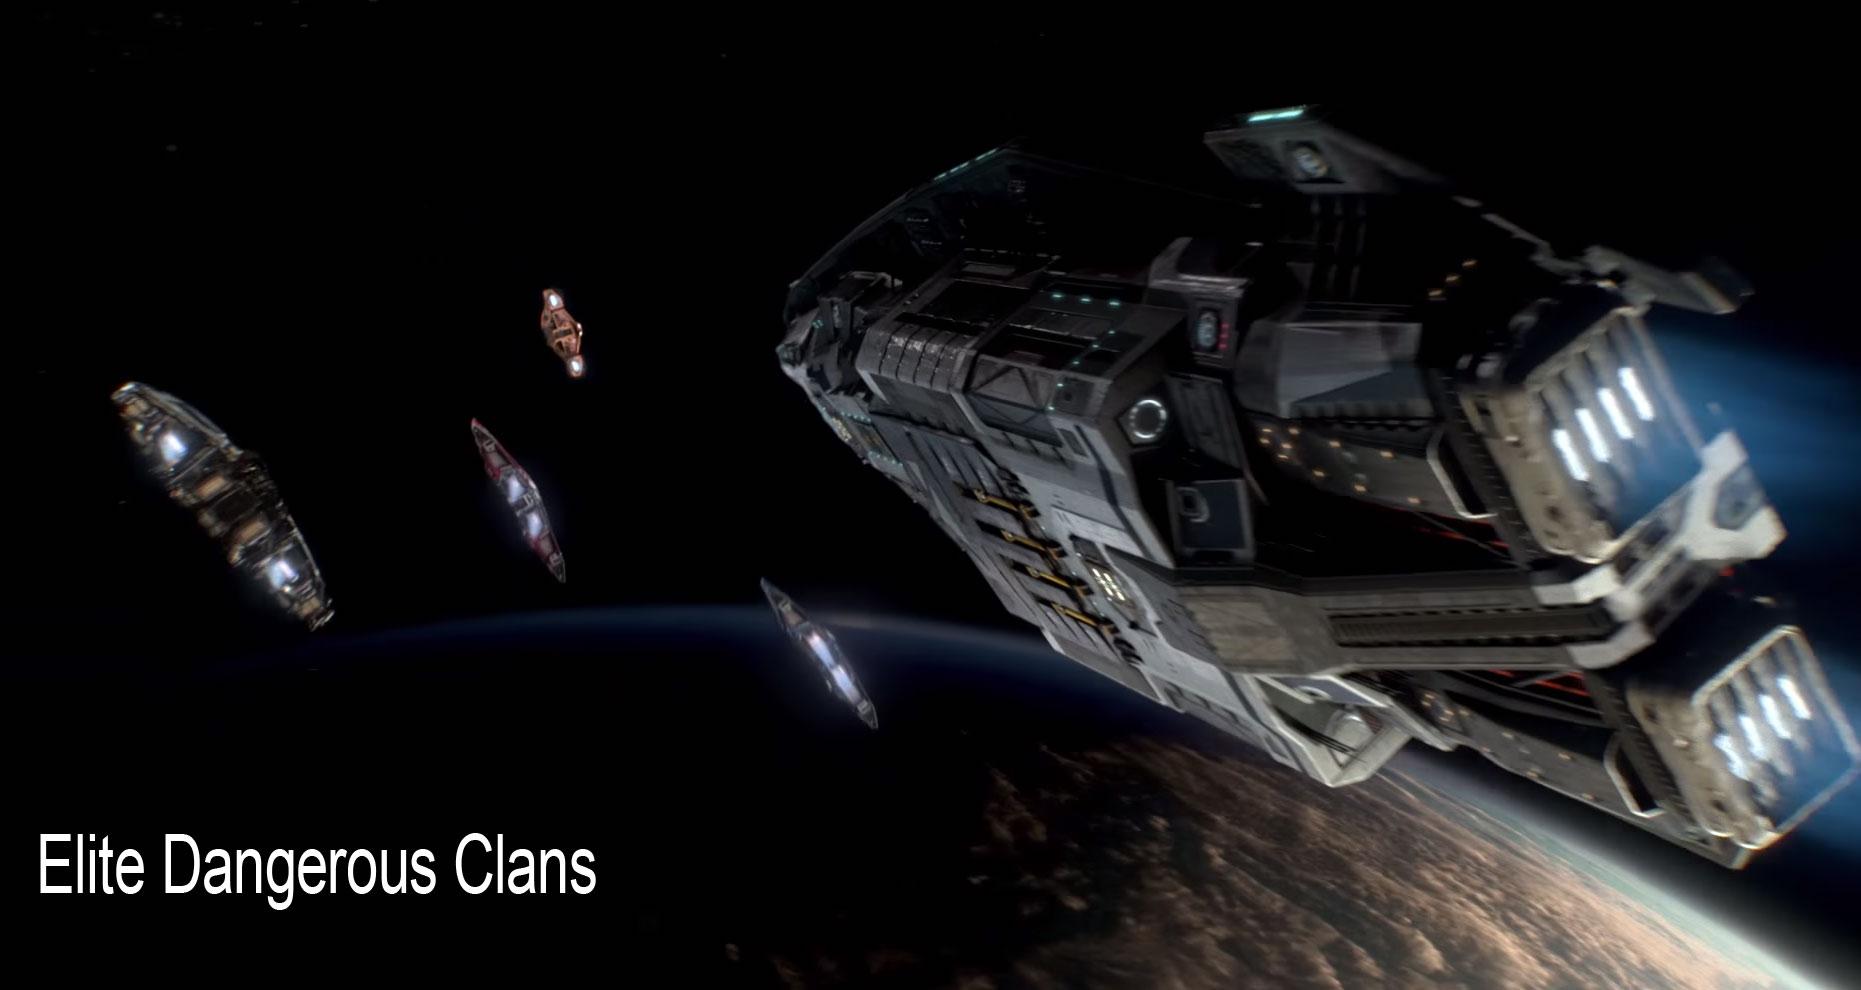 elite dangerous clans radio